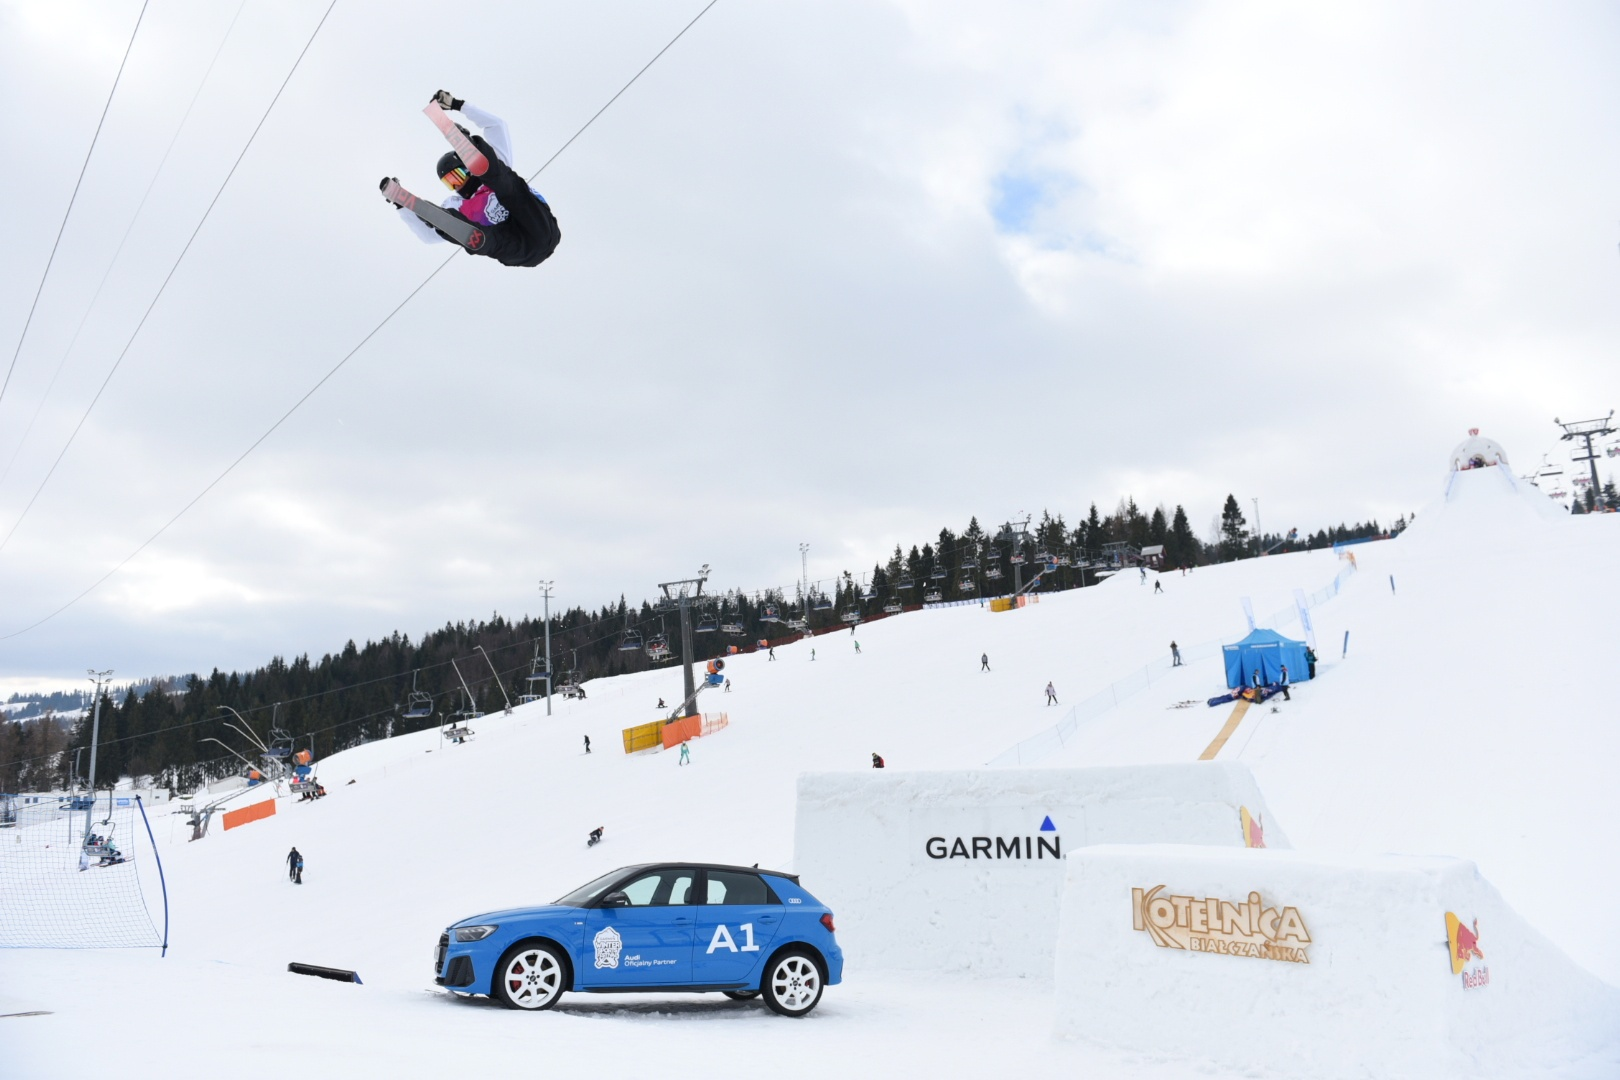 Garmin Winter Sports Festival 2019 - ski